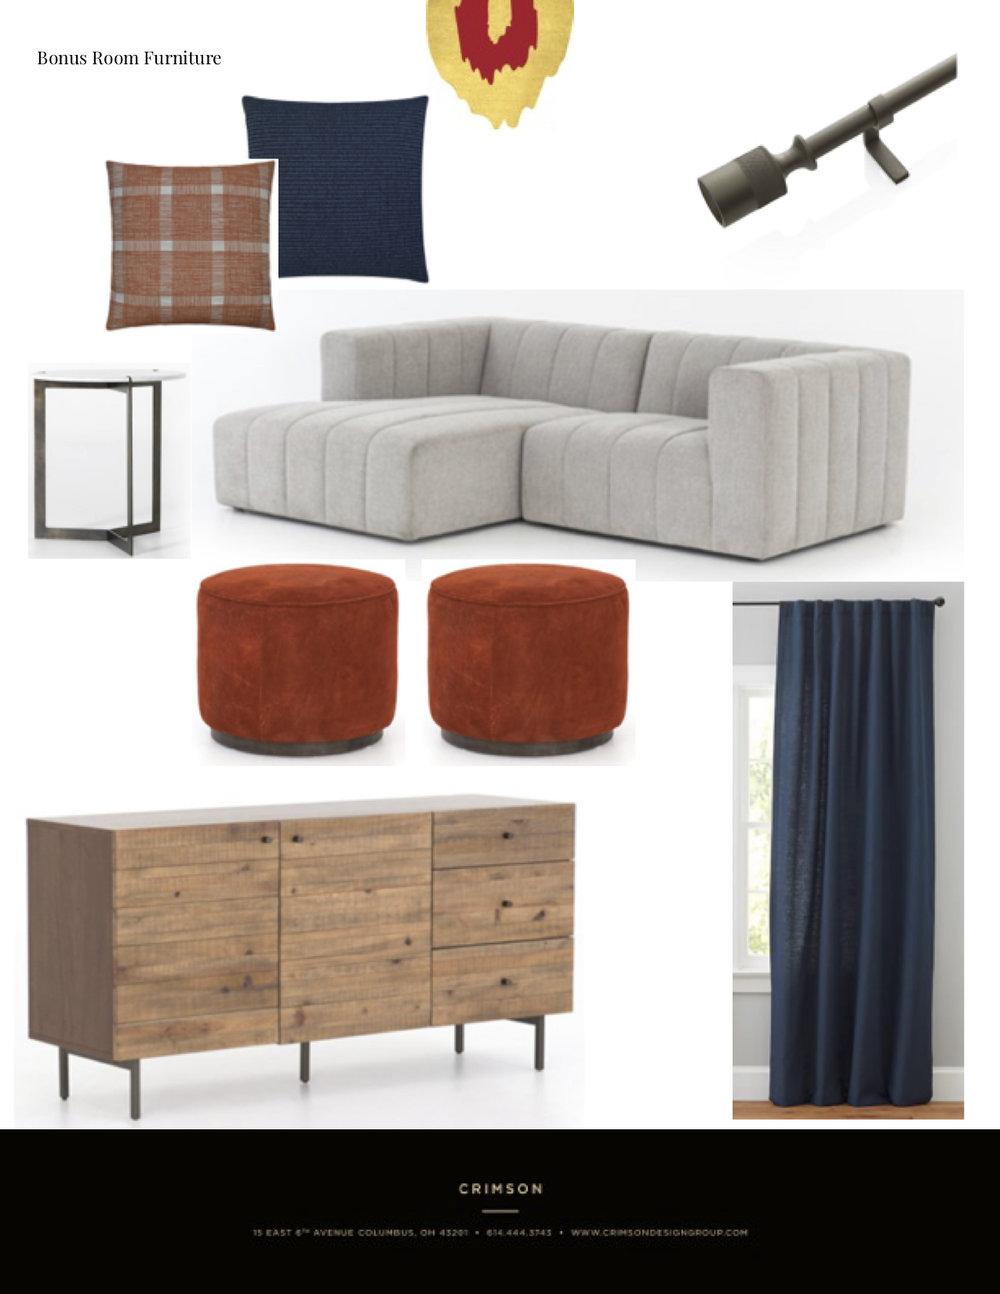 Manning, Furniture Presentation 7.31.2018 (dragged) 9.jpg